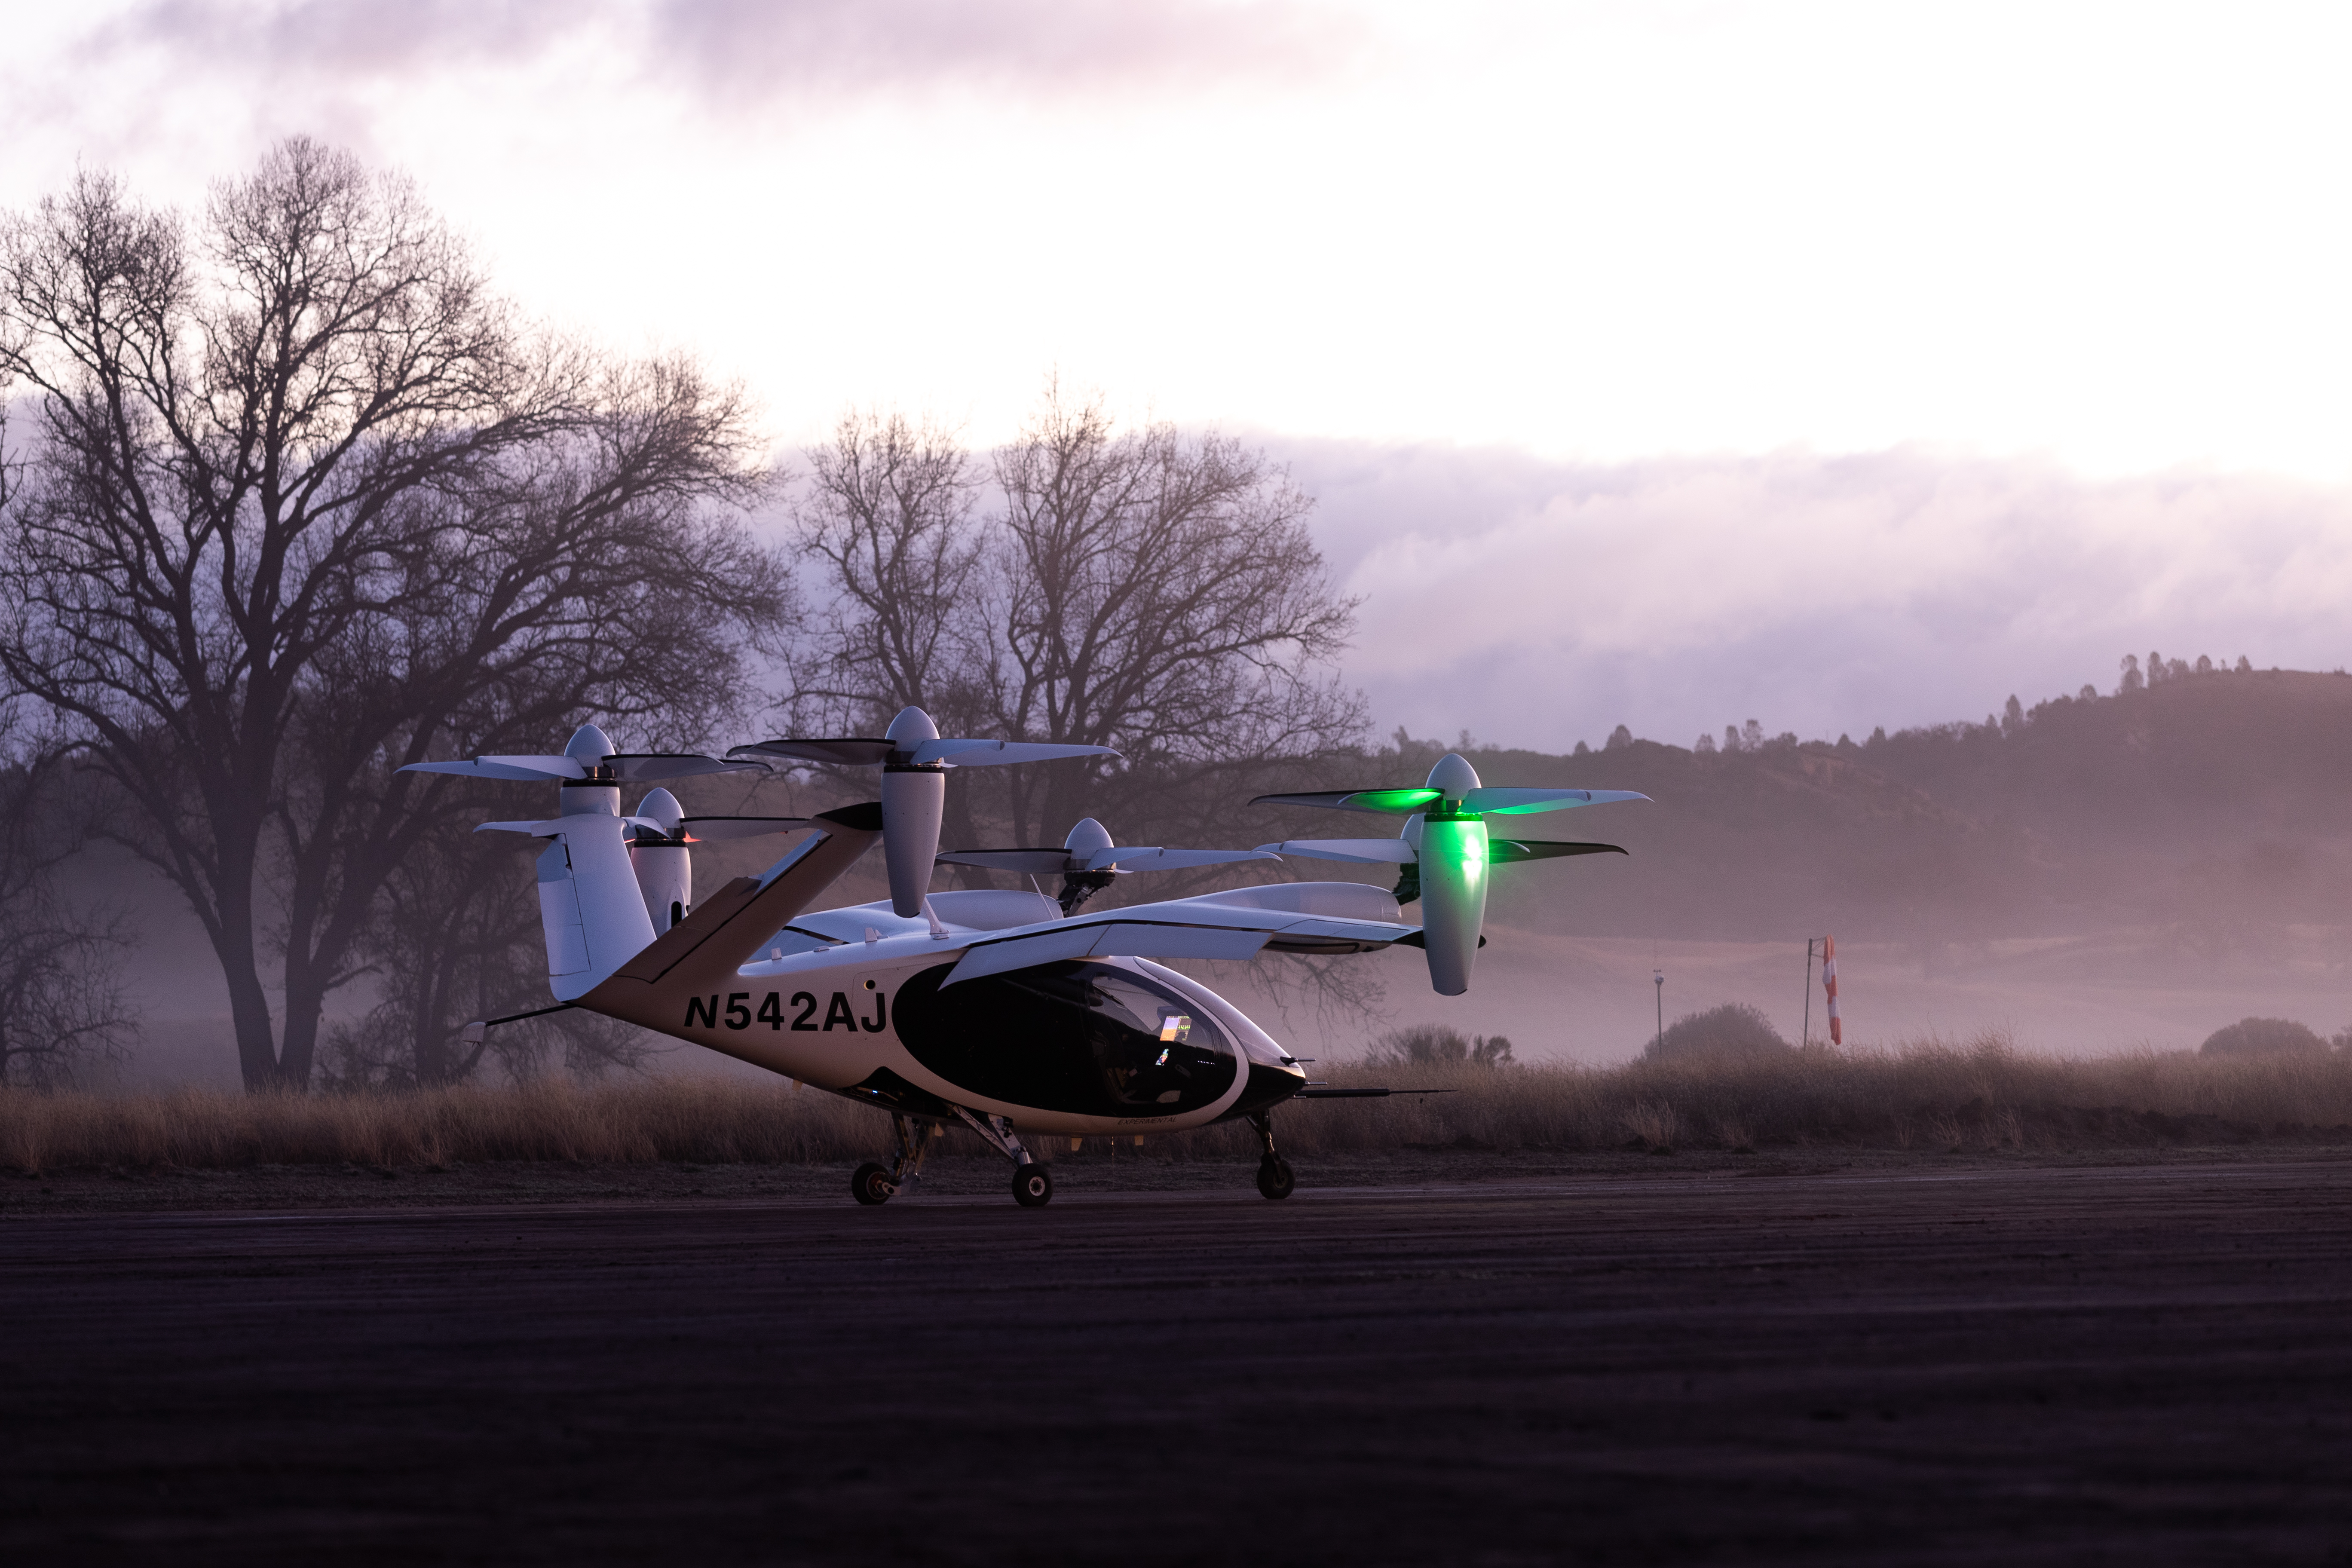 L'eVTOL di Joby Aviation presso la base di Big Sur. Credits: Joby Aviation